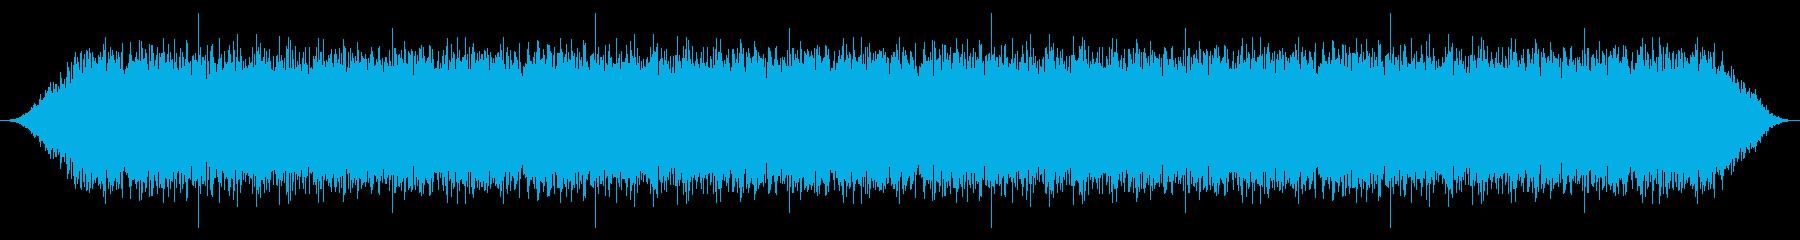 PC 駆動音02-08(ロング)の再生済みの波形